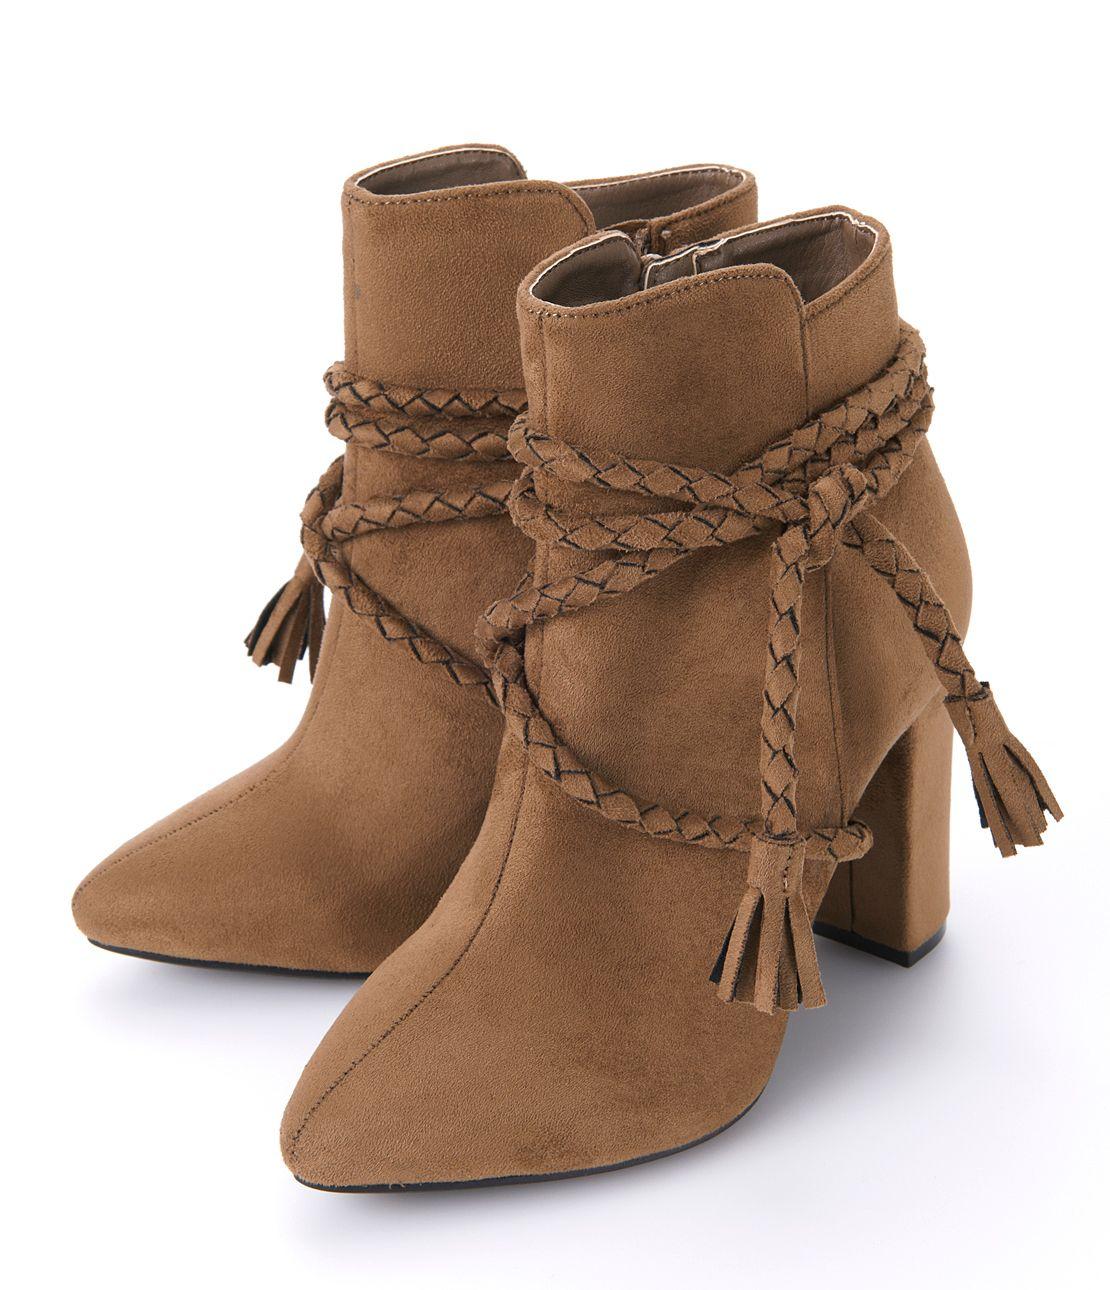 Fringe belt boots